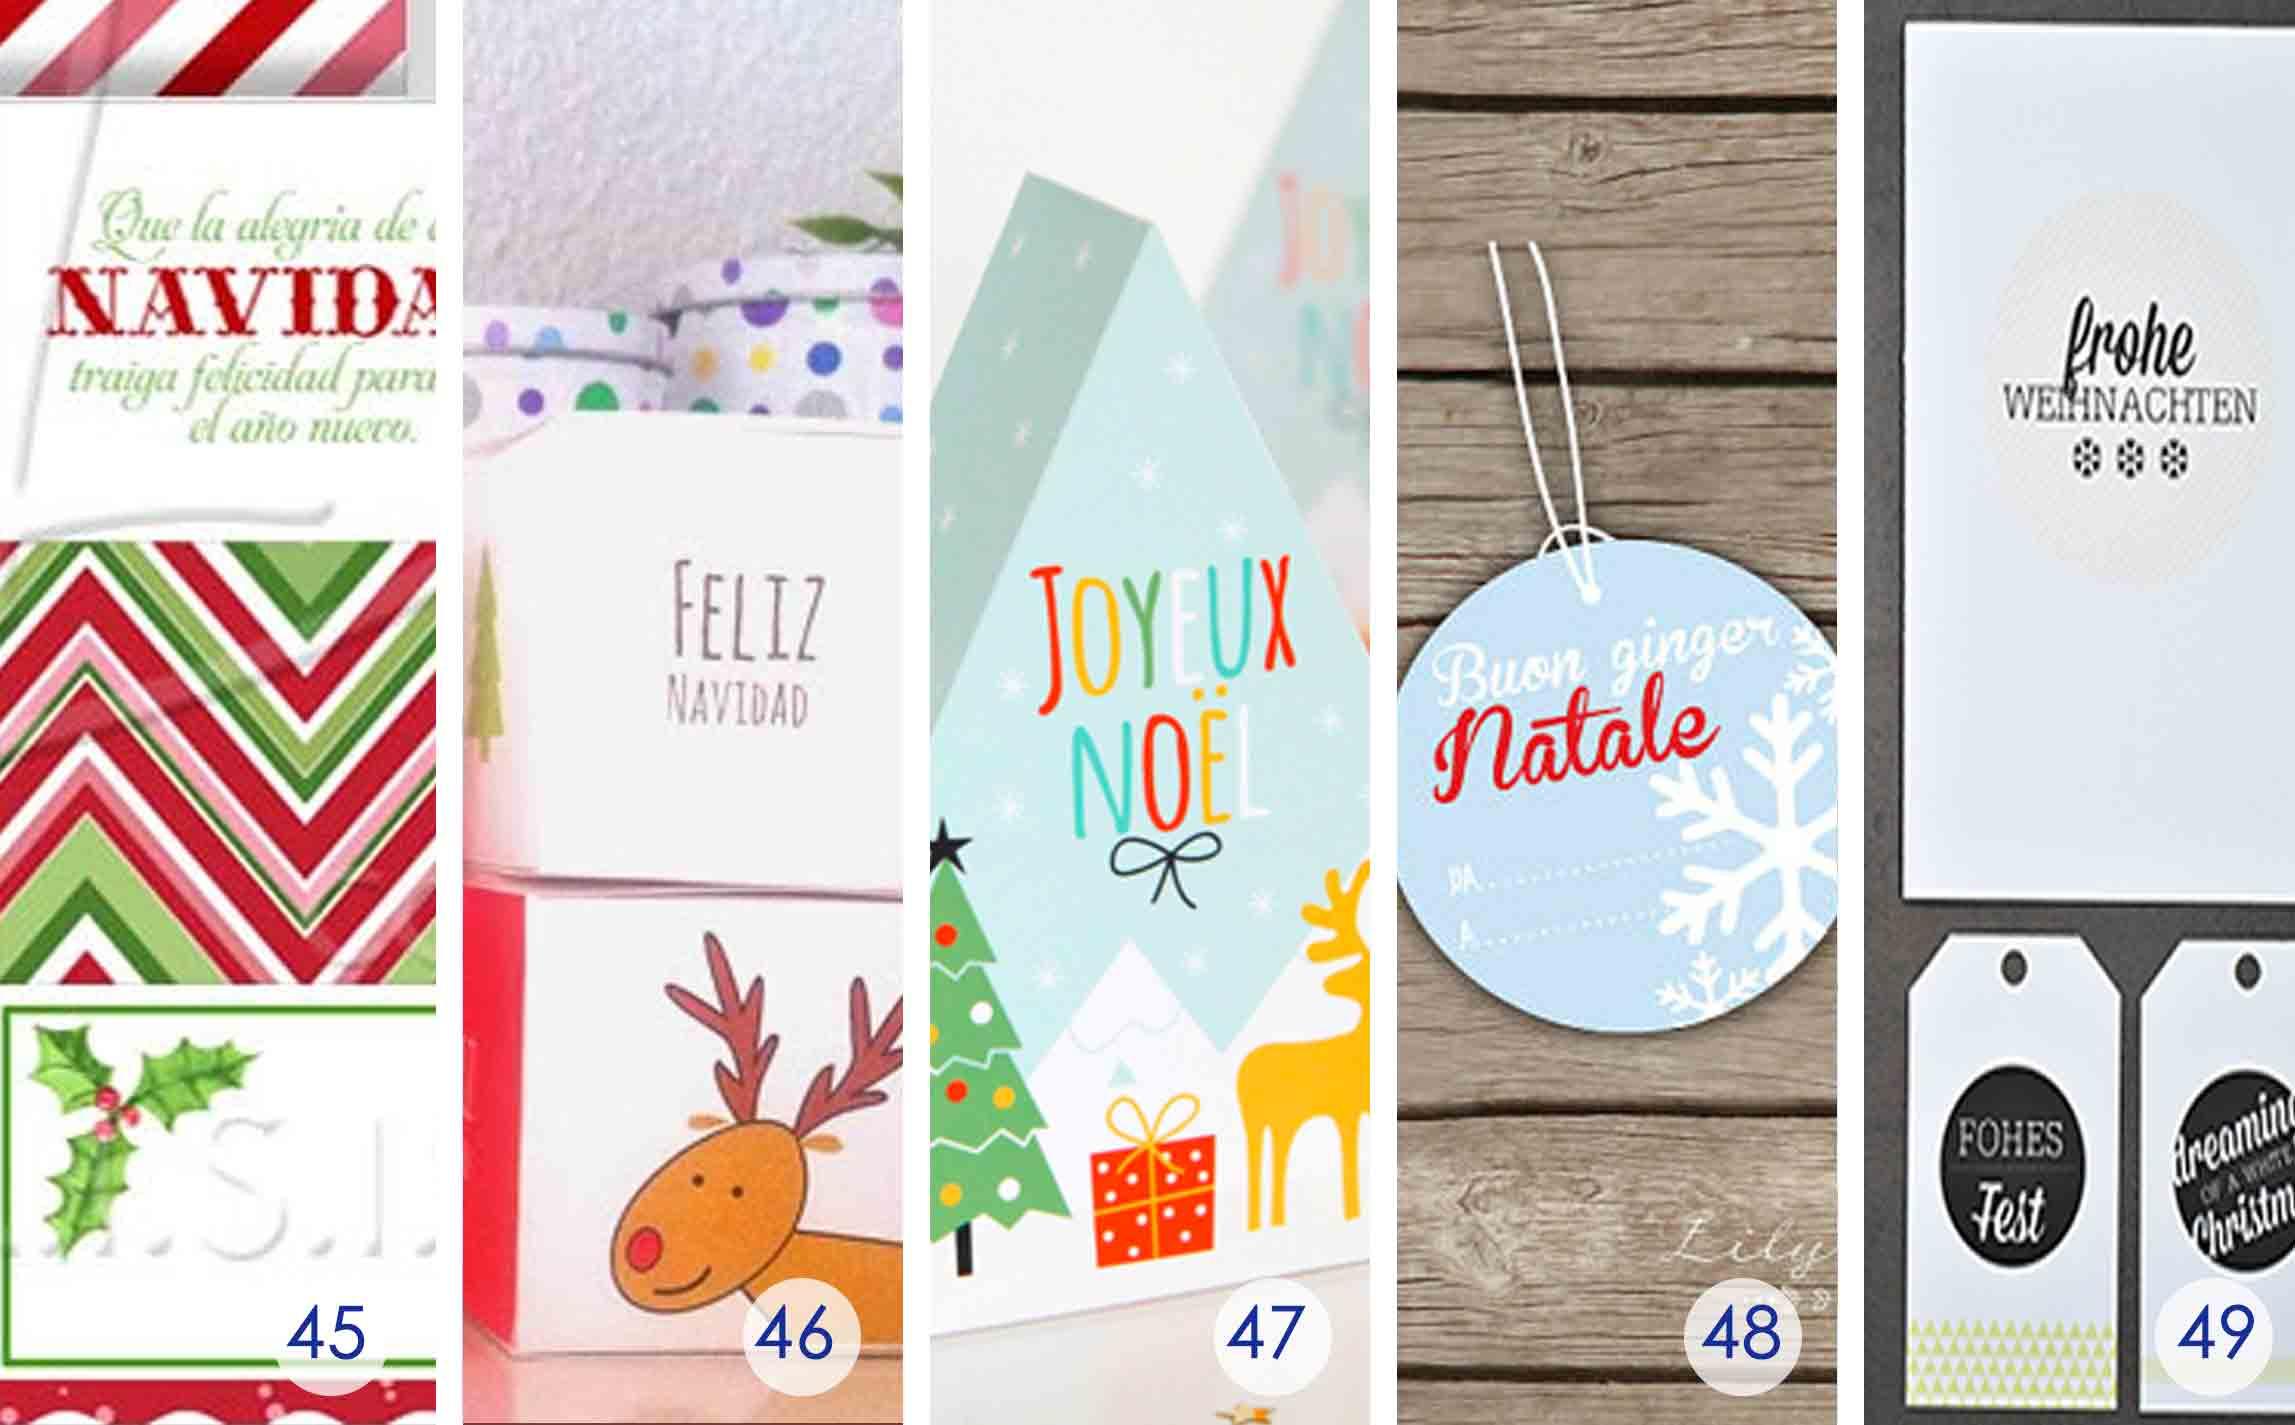 Over 50 Printable Gift Card Holders For The Holidays   Gcg - Christmas Money Wallets Free Printable